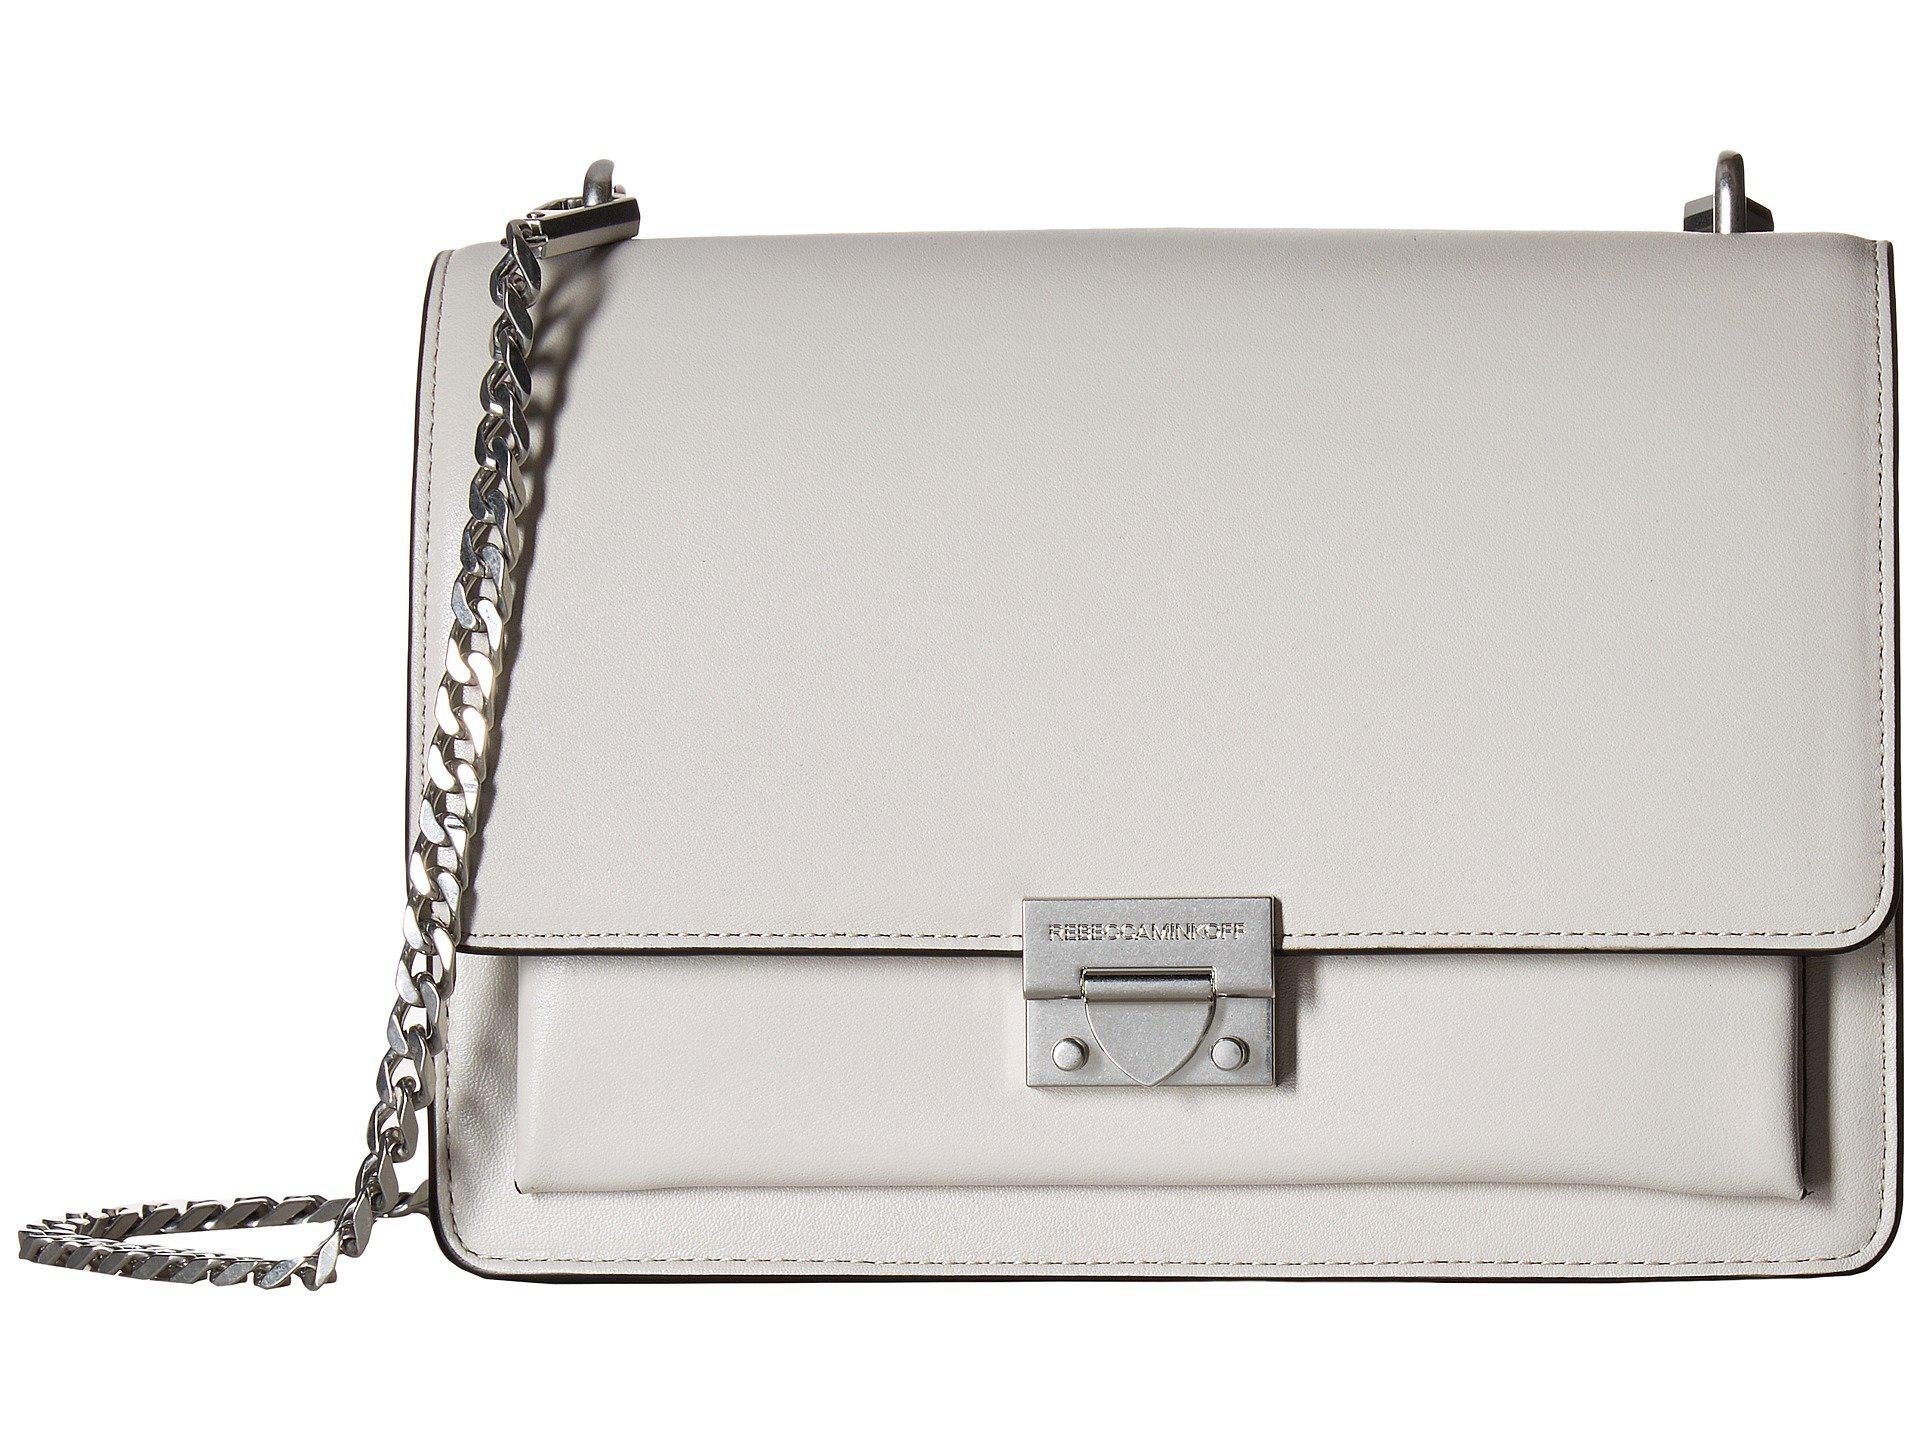 c0725c70d8f56 Rebecca Minkoff. Women s Christy Medium Shoulder Bag (putty) Handbags